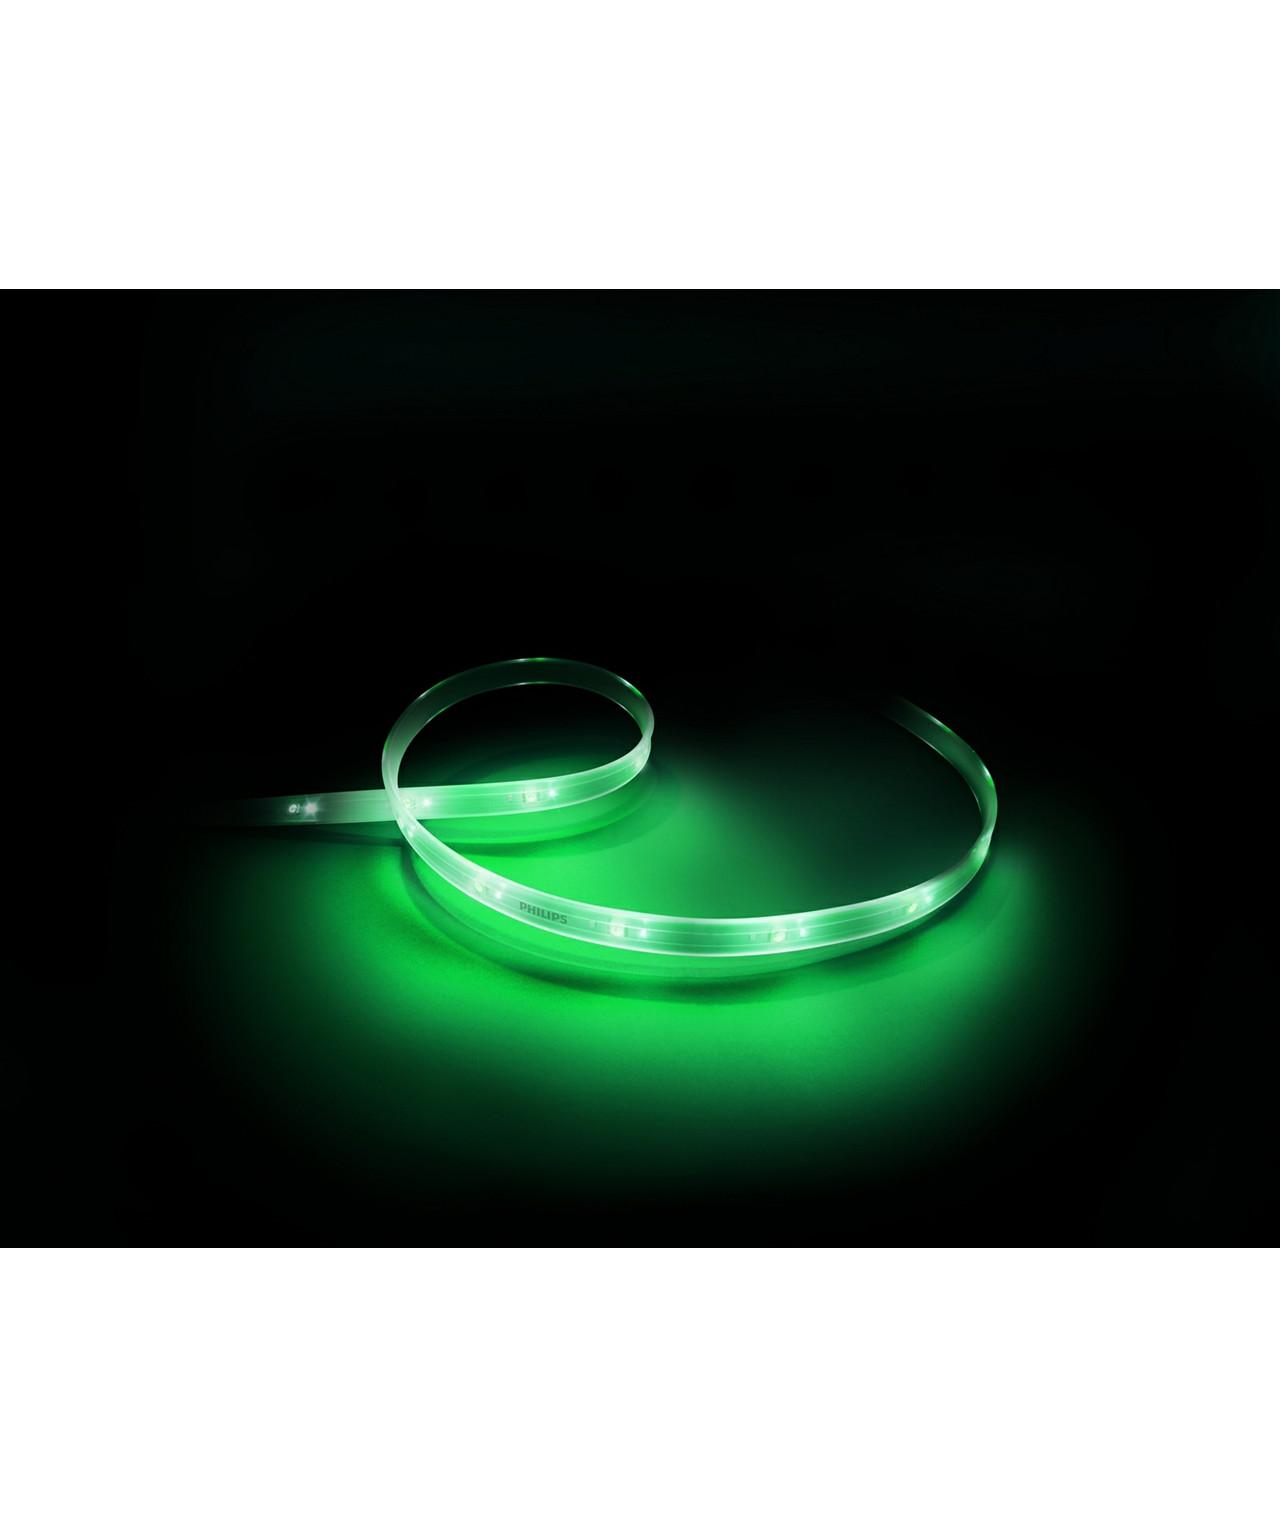 Philips Hue LightStrips Plus